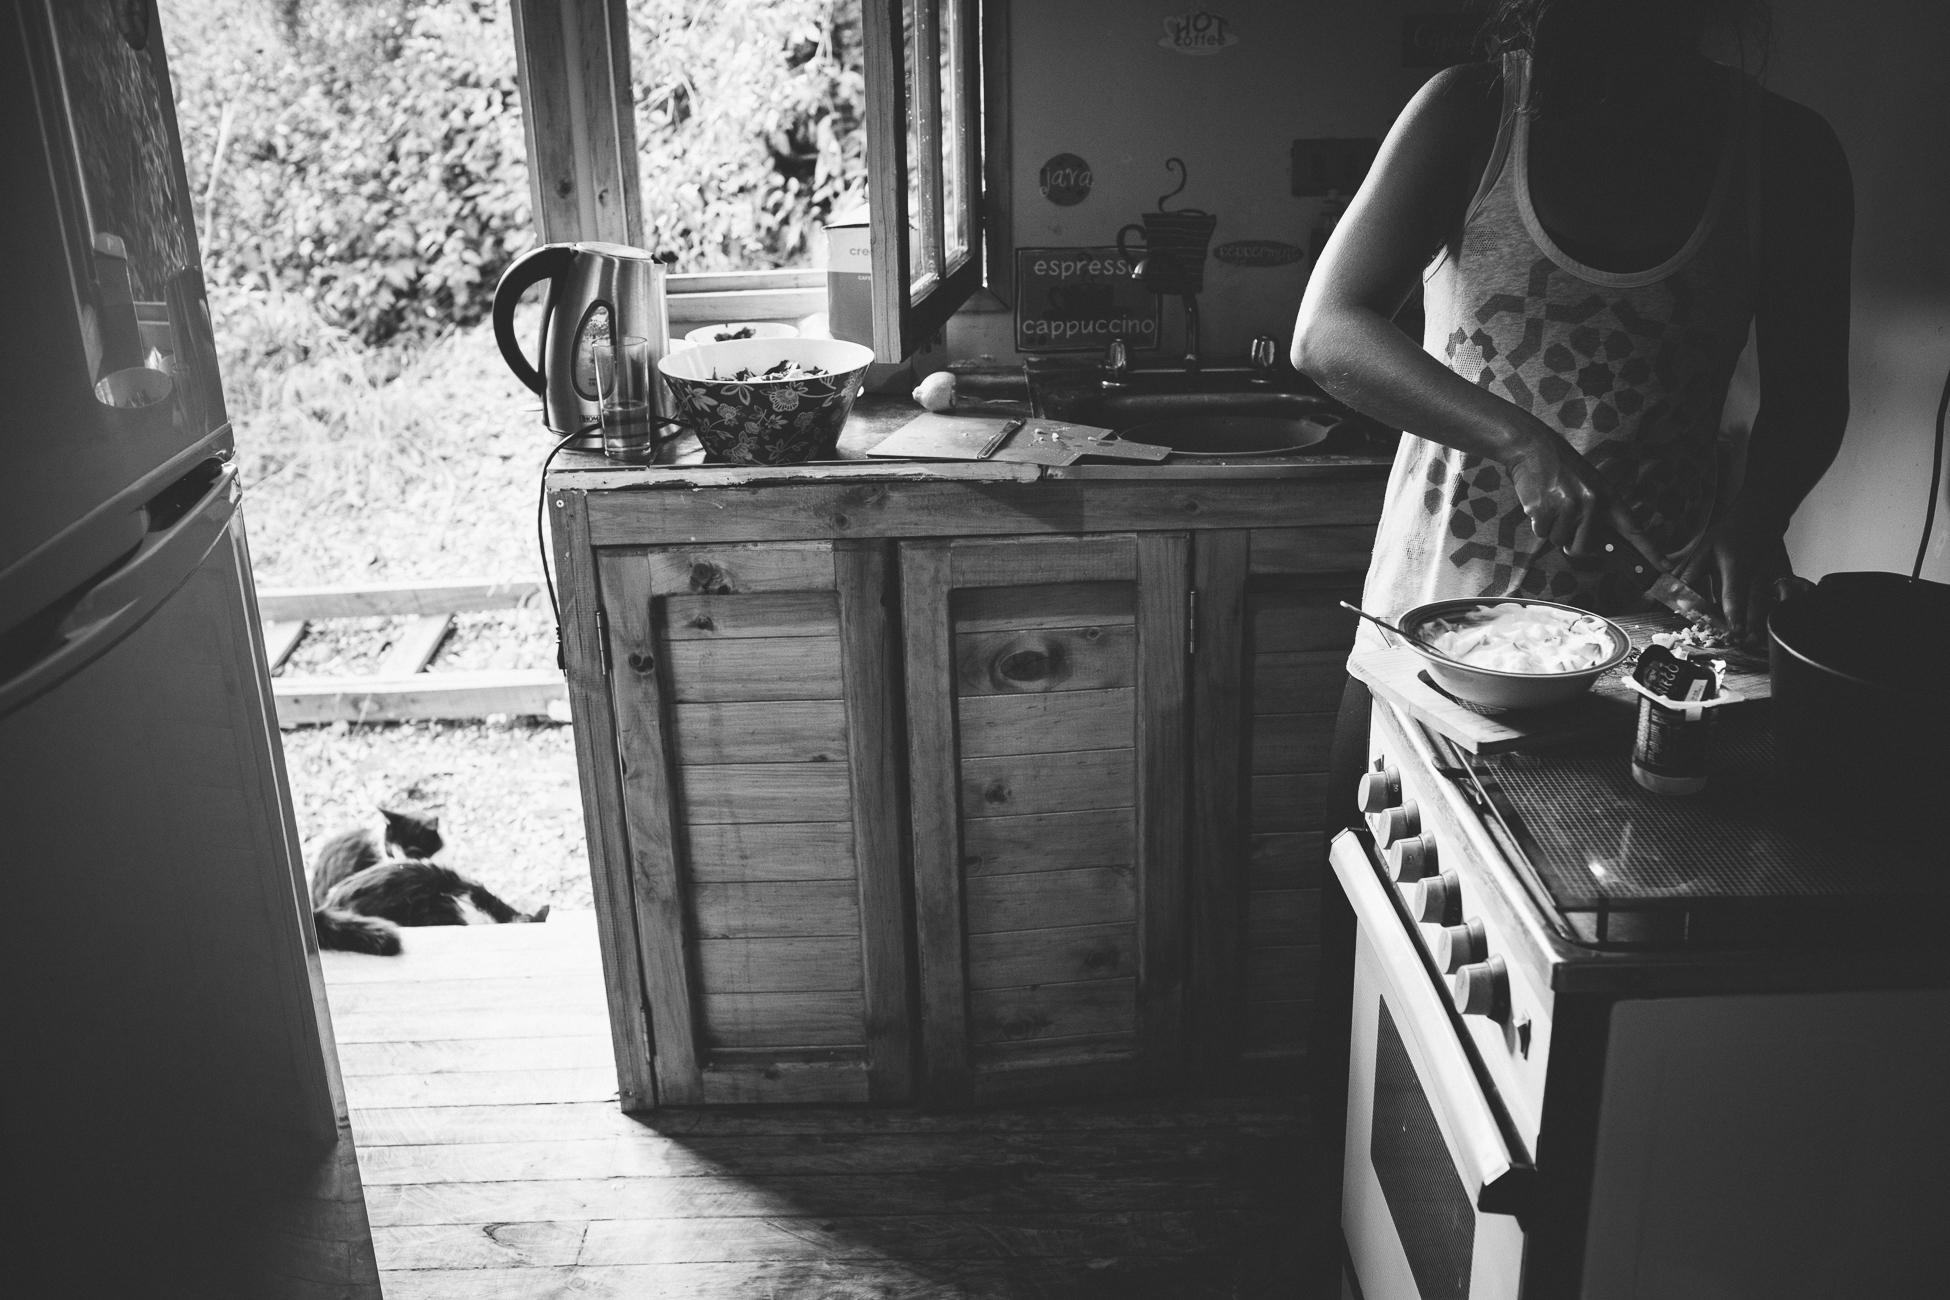 desktoglory_chile_cabin_hopping-31